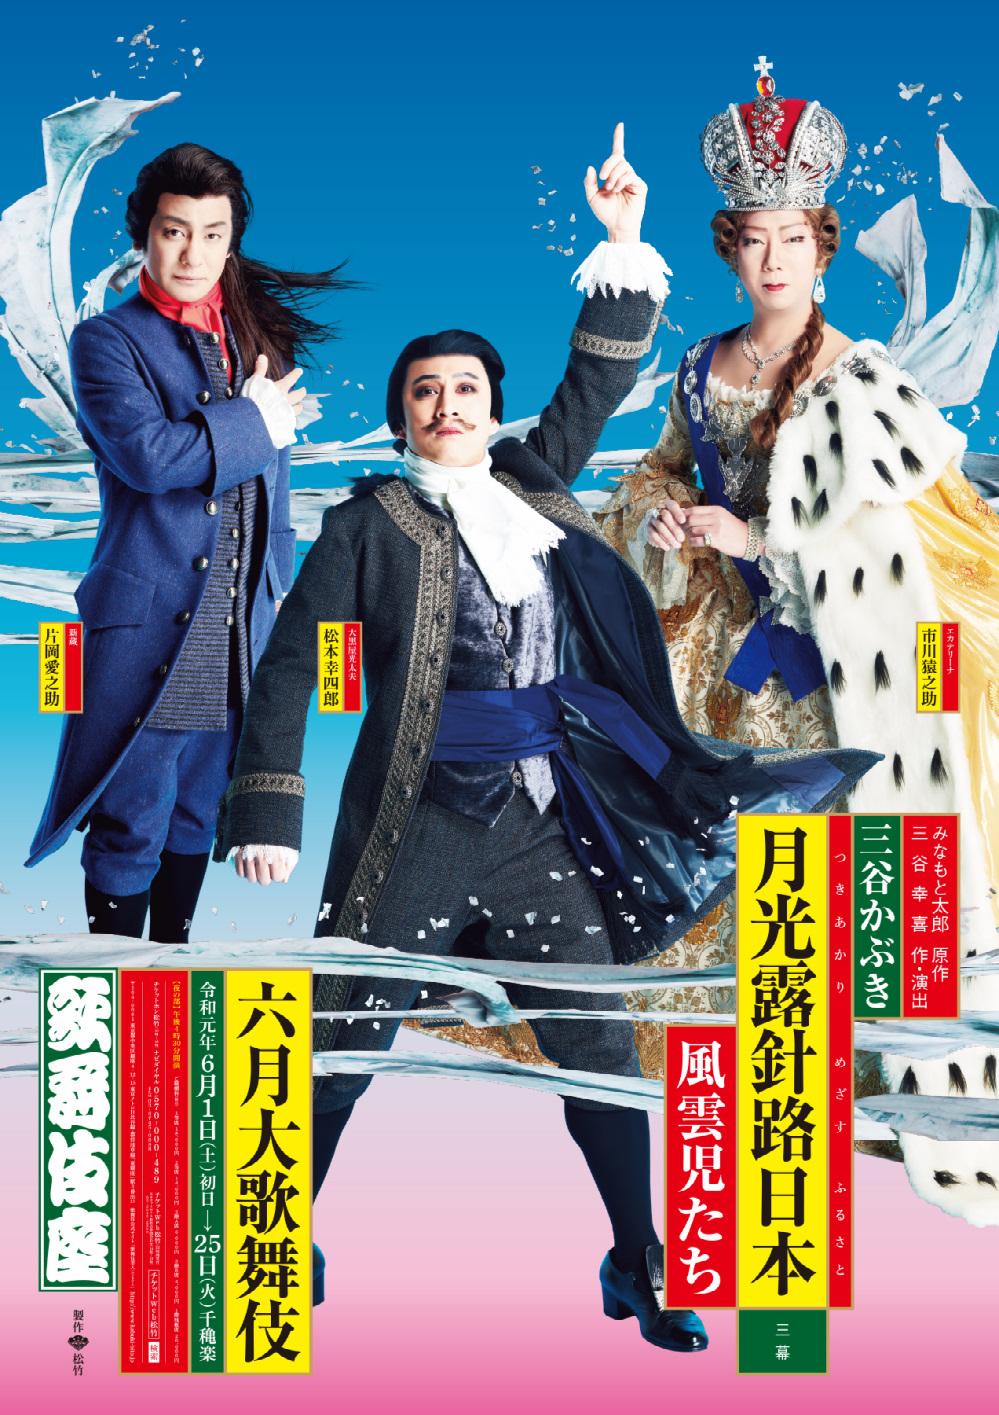 歌舞伎座『月光露針路日本 風雲児たち』特別ポスター公開